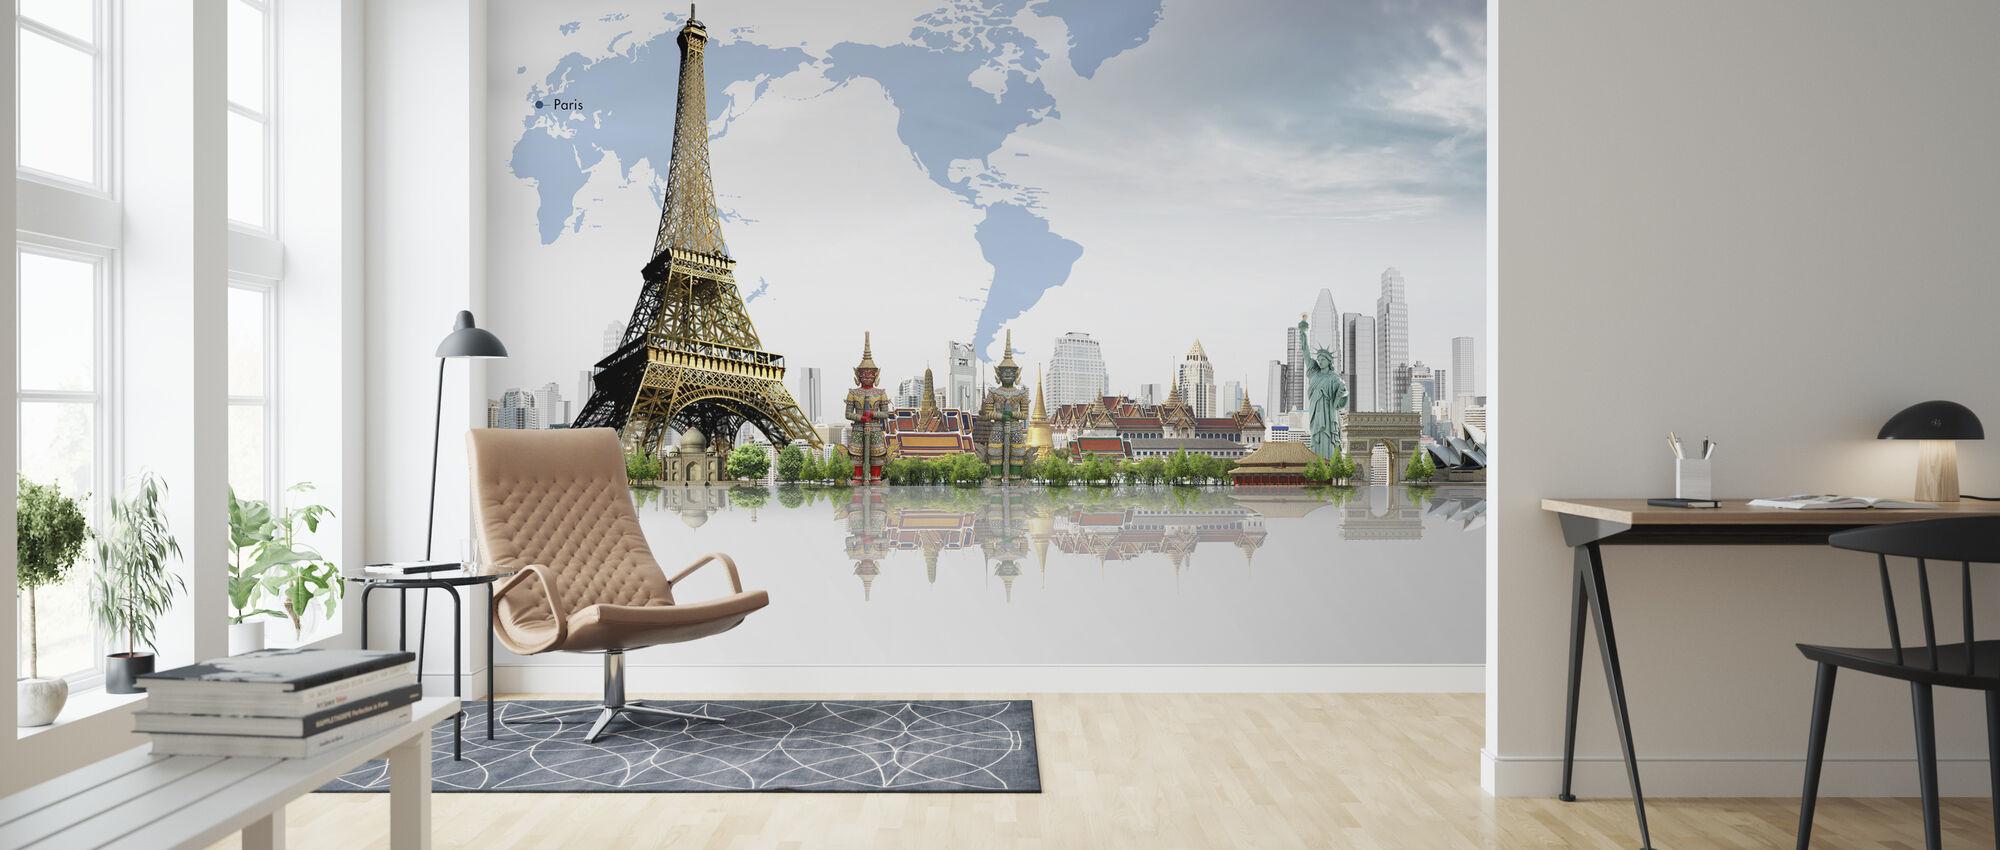 Travel Concept - Wallpaper - Living Room